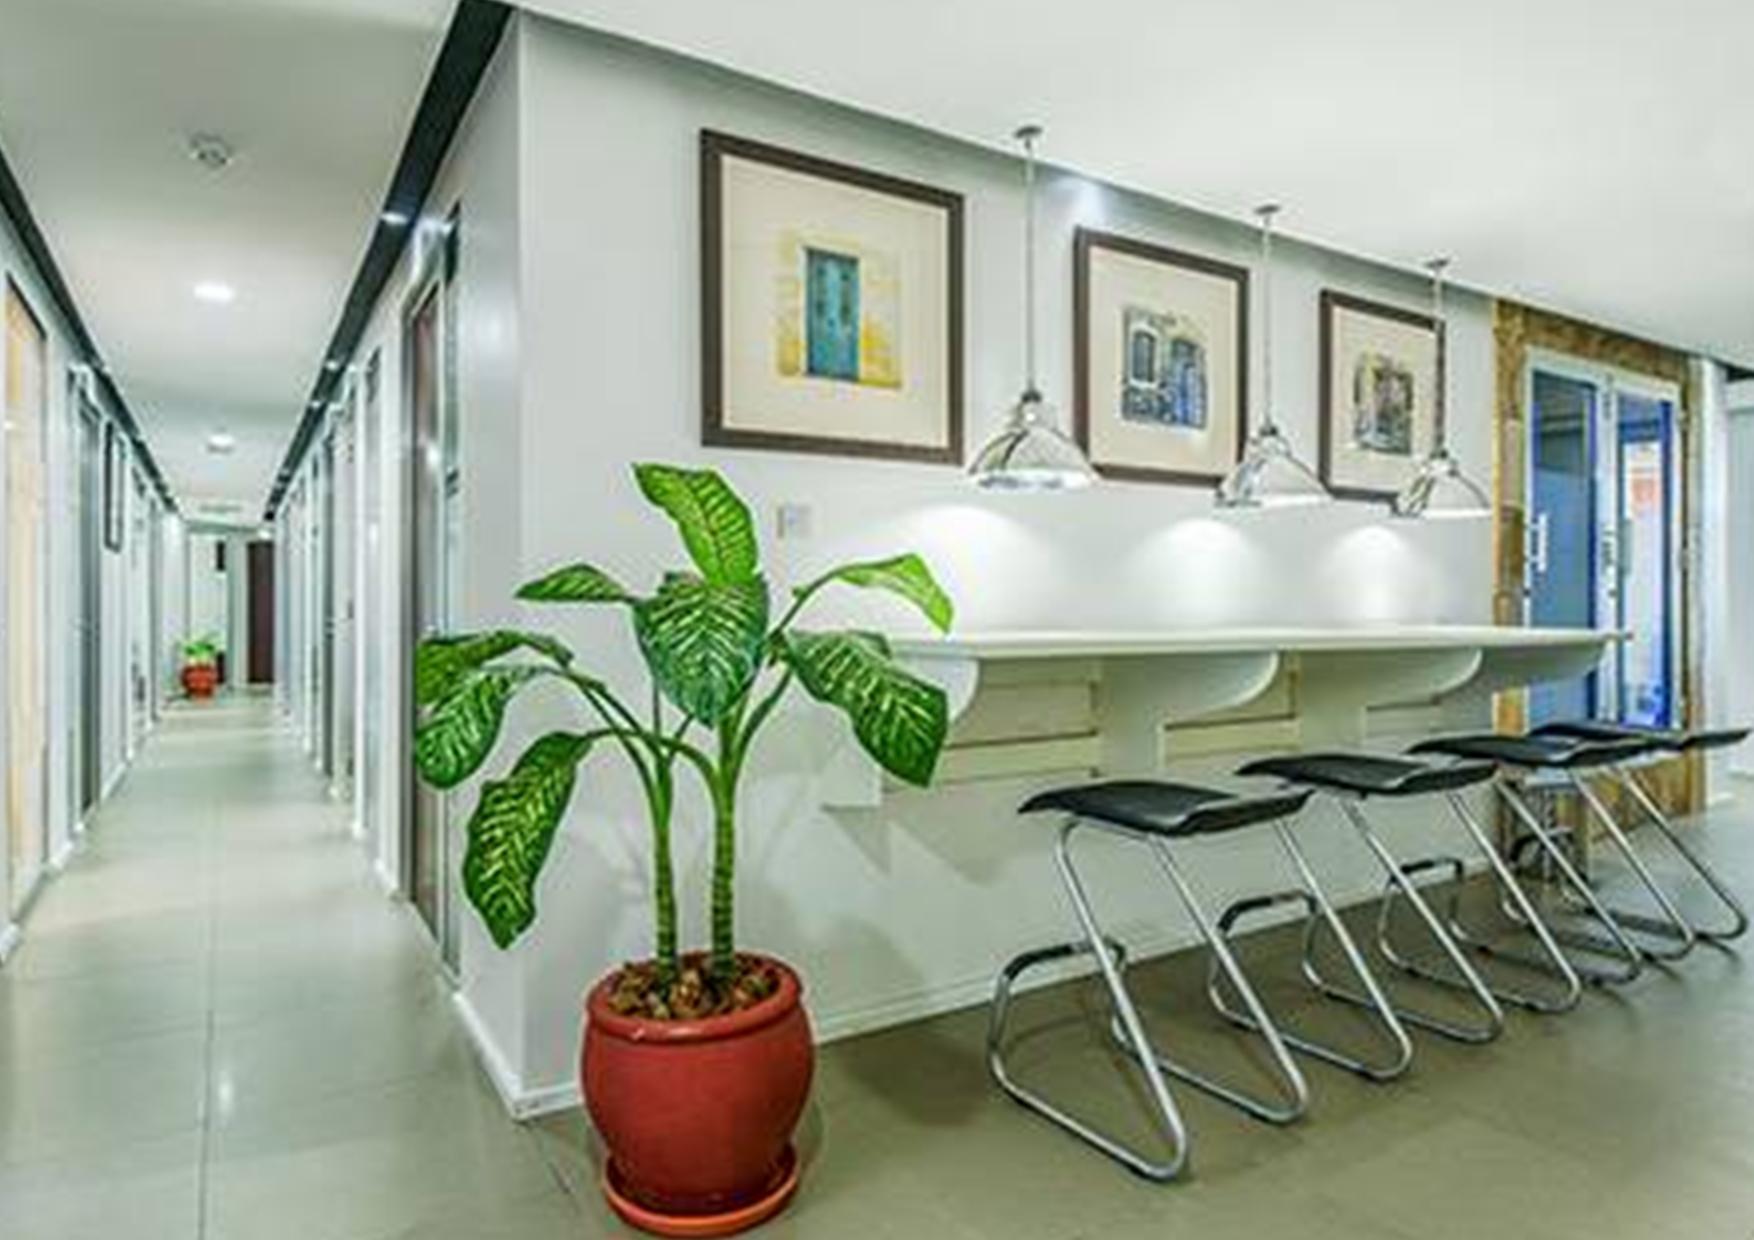 Global agency planning for Dar es Salaam business center